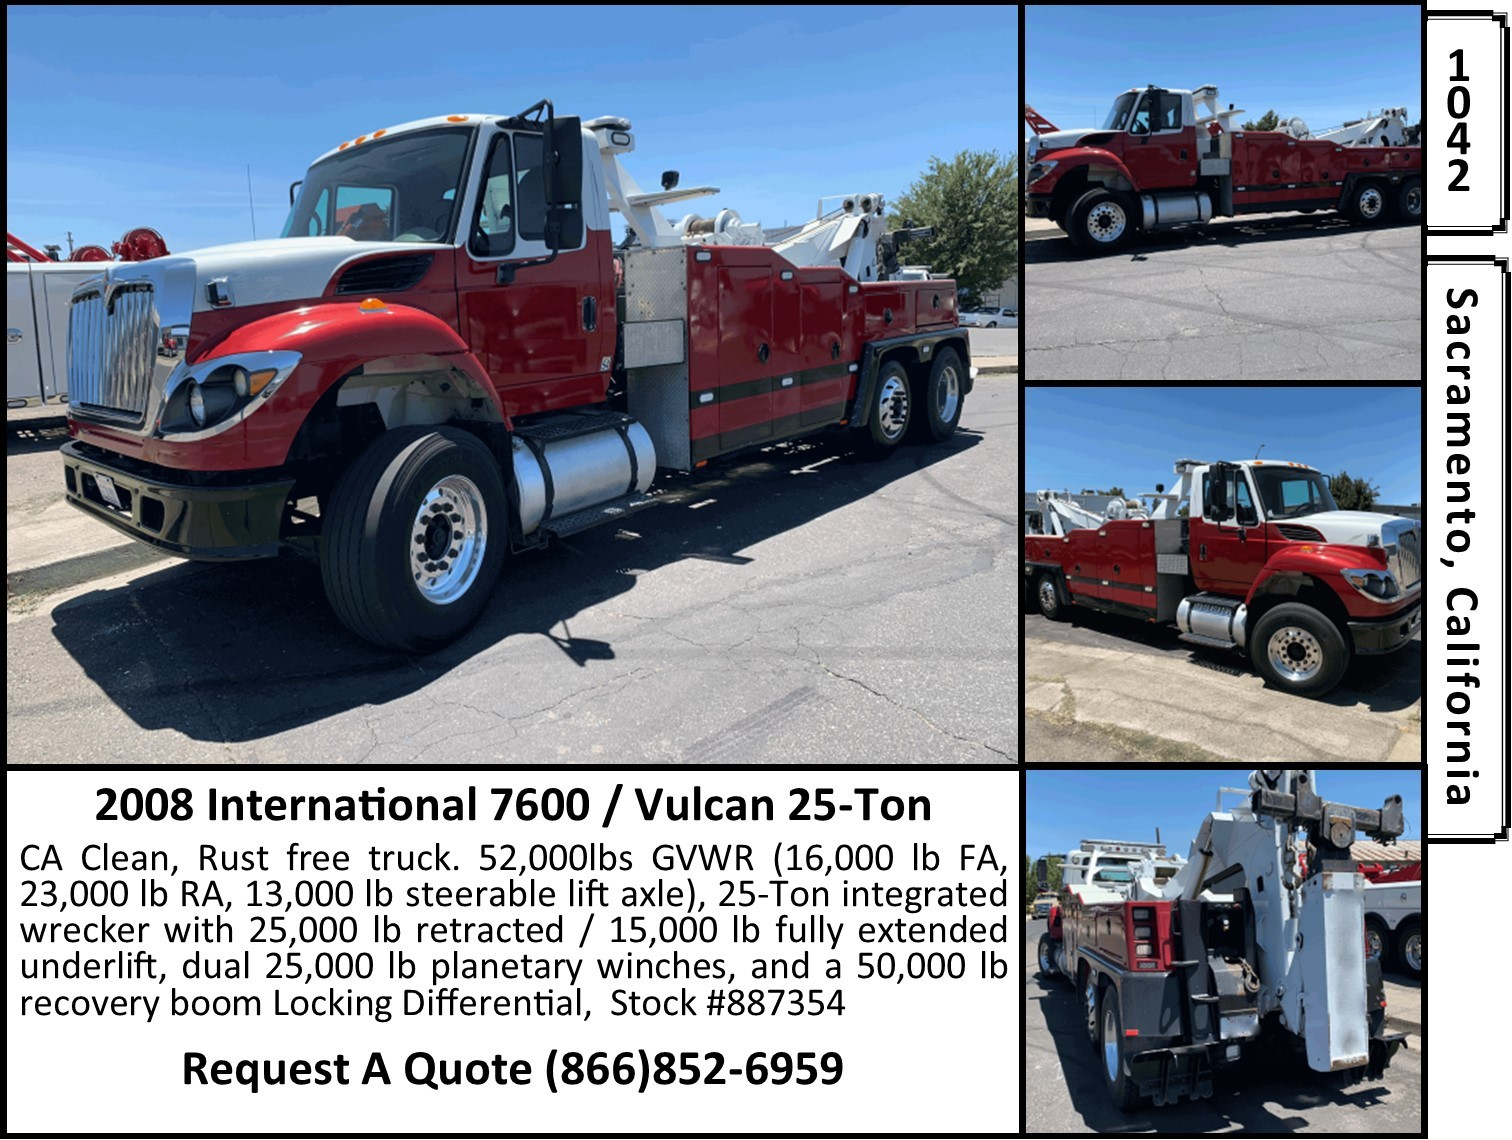 Used, 2008, International, 7600 / Vulcan 25T Wrecker, Tow Trucks